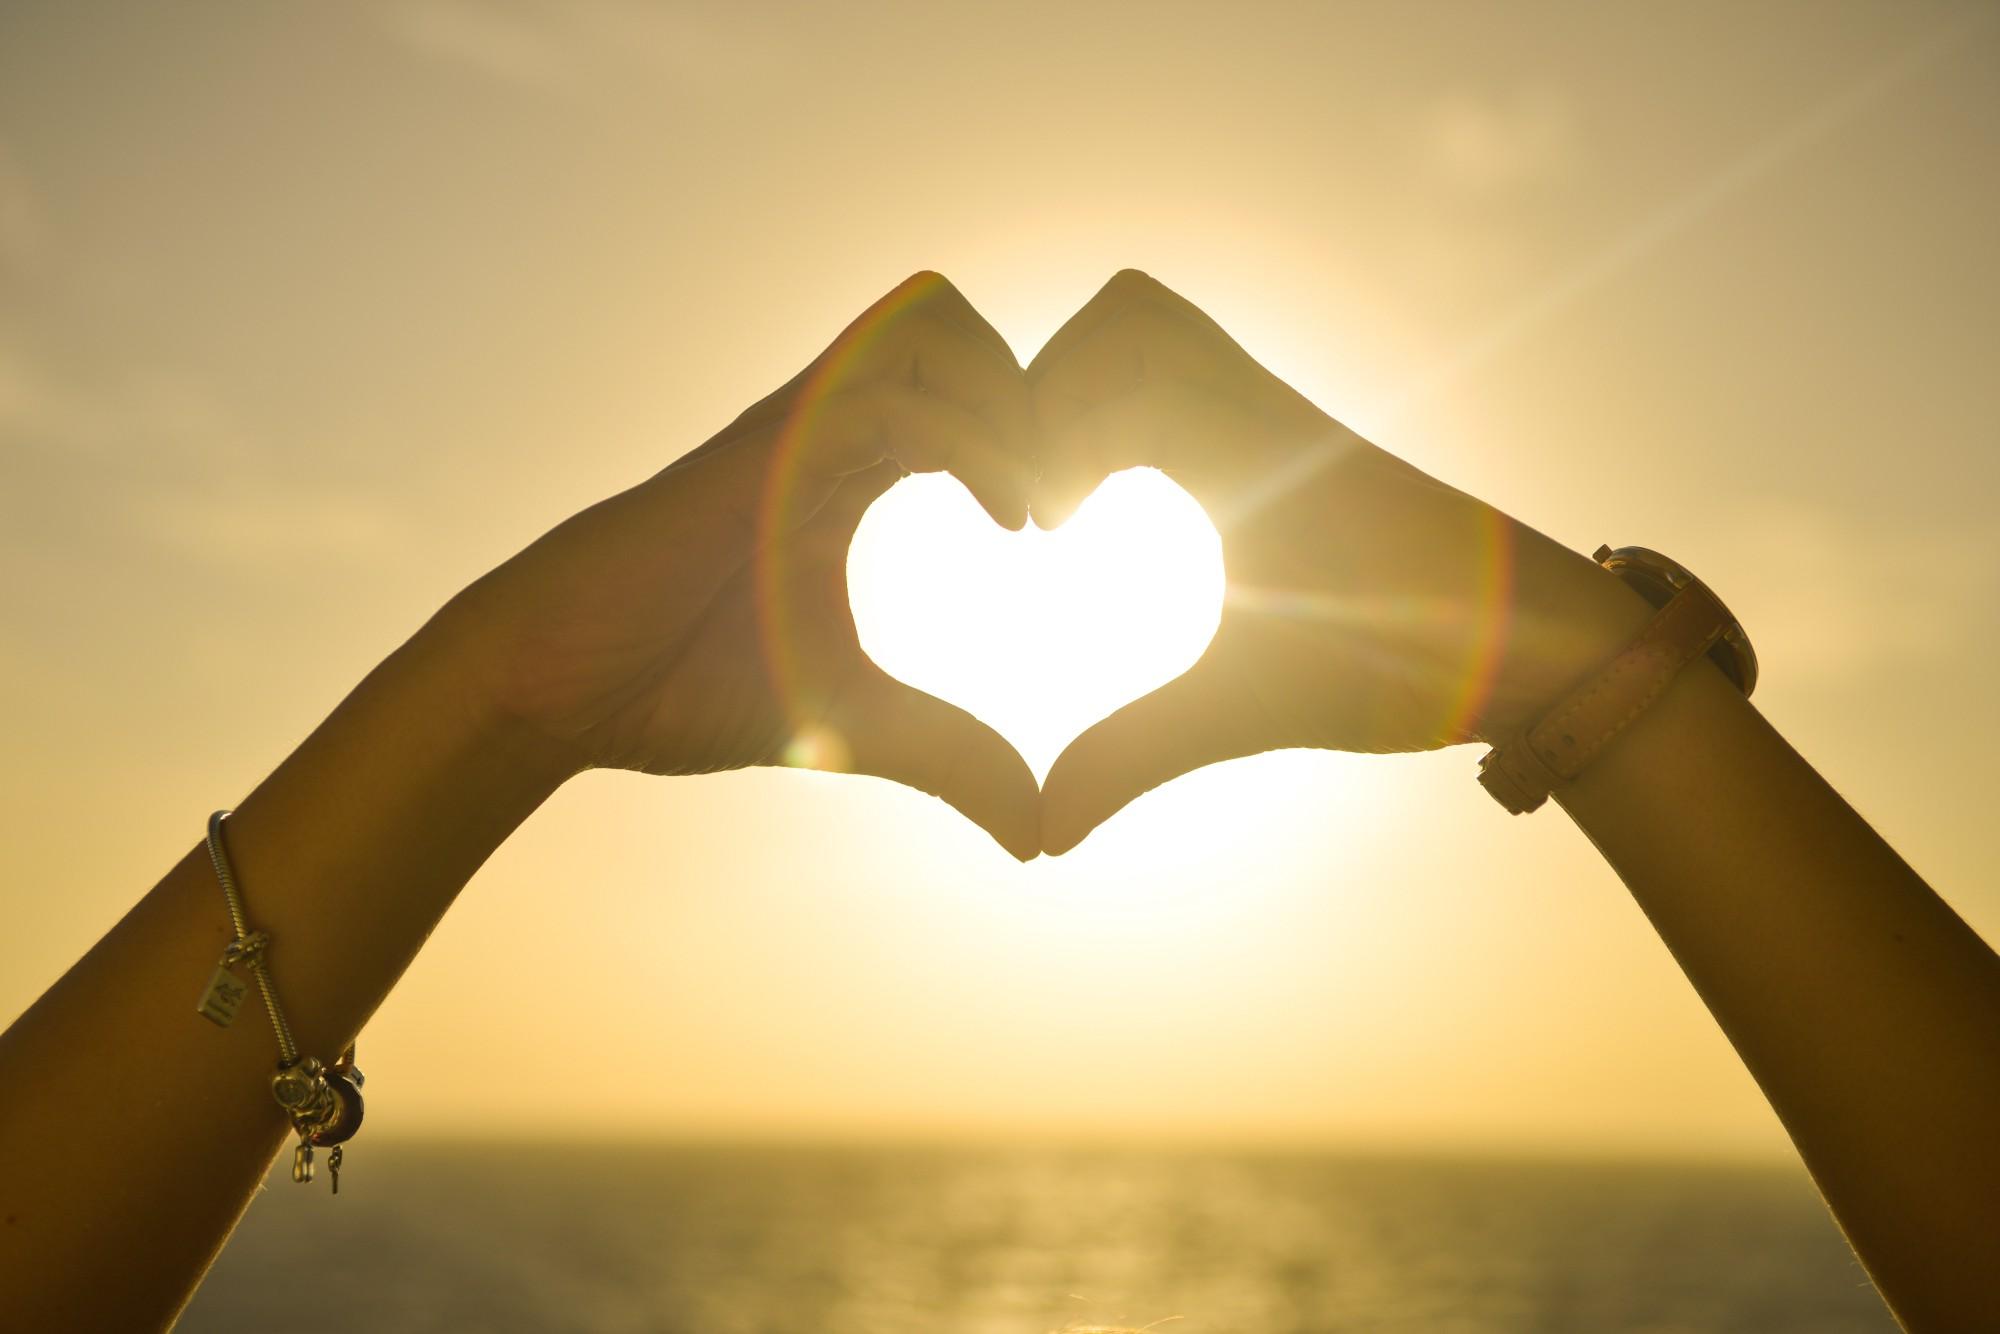 Sering Merasa Hampa? Berikut 3 Cara agar Lebih Dicintai